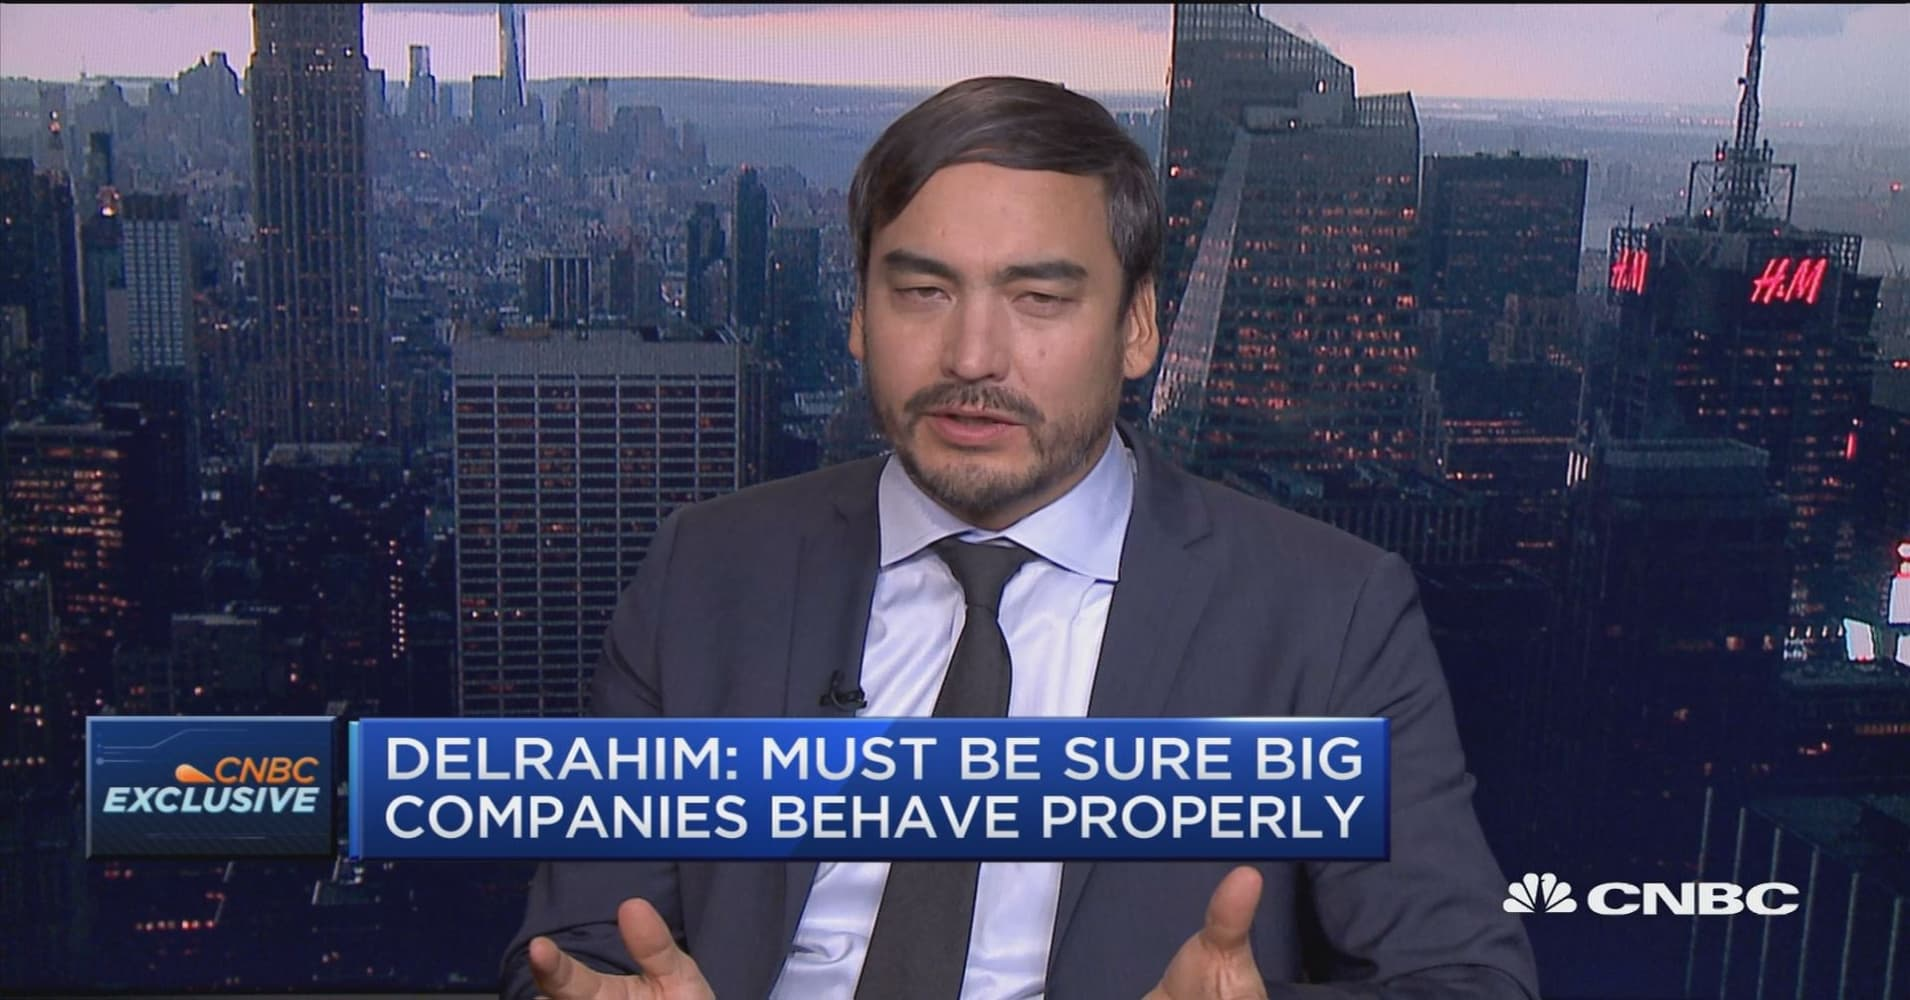 Columbia Law School's Tim Wu says big tech companies stifle innovation in US